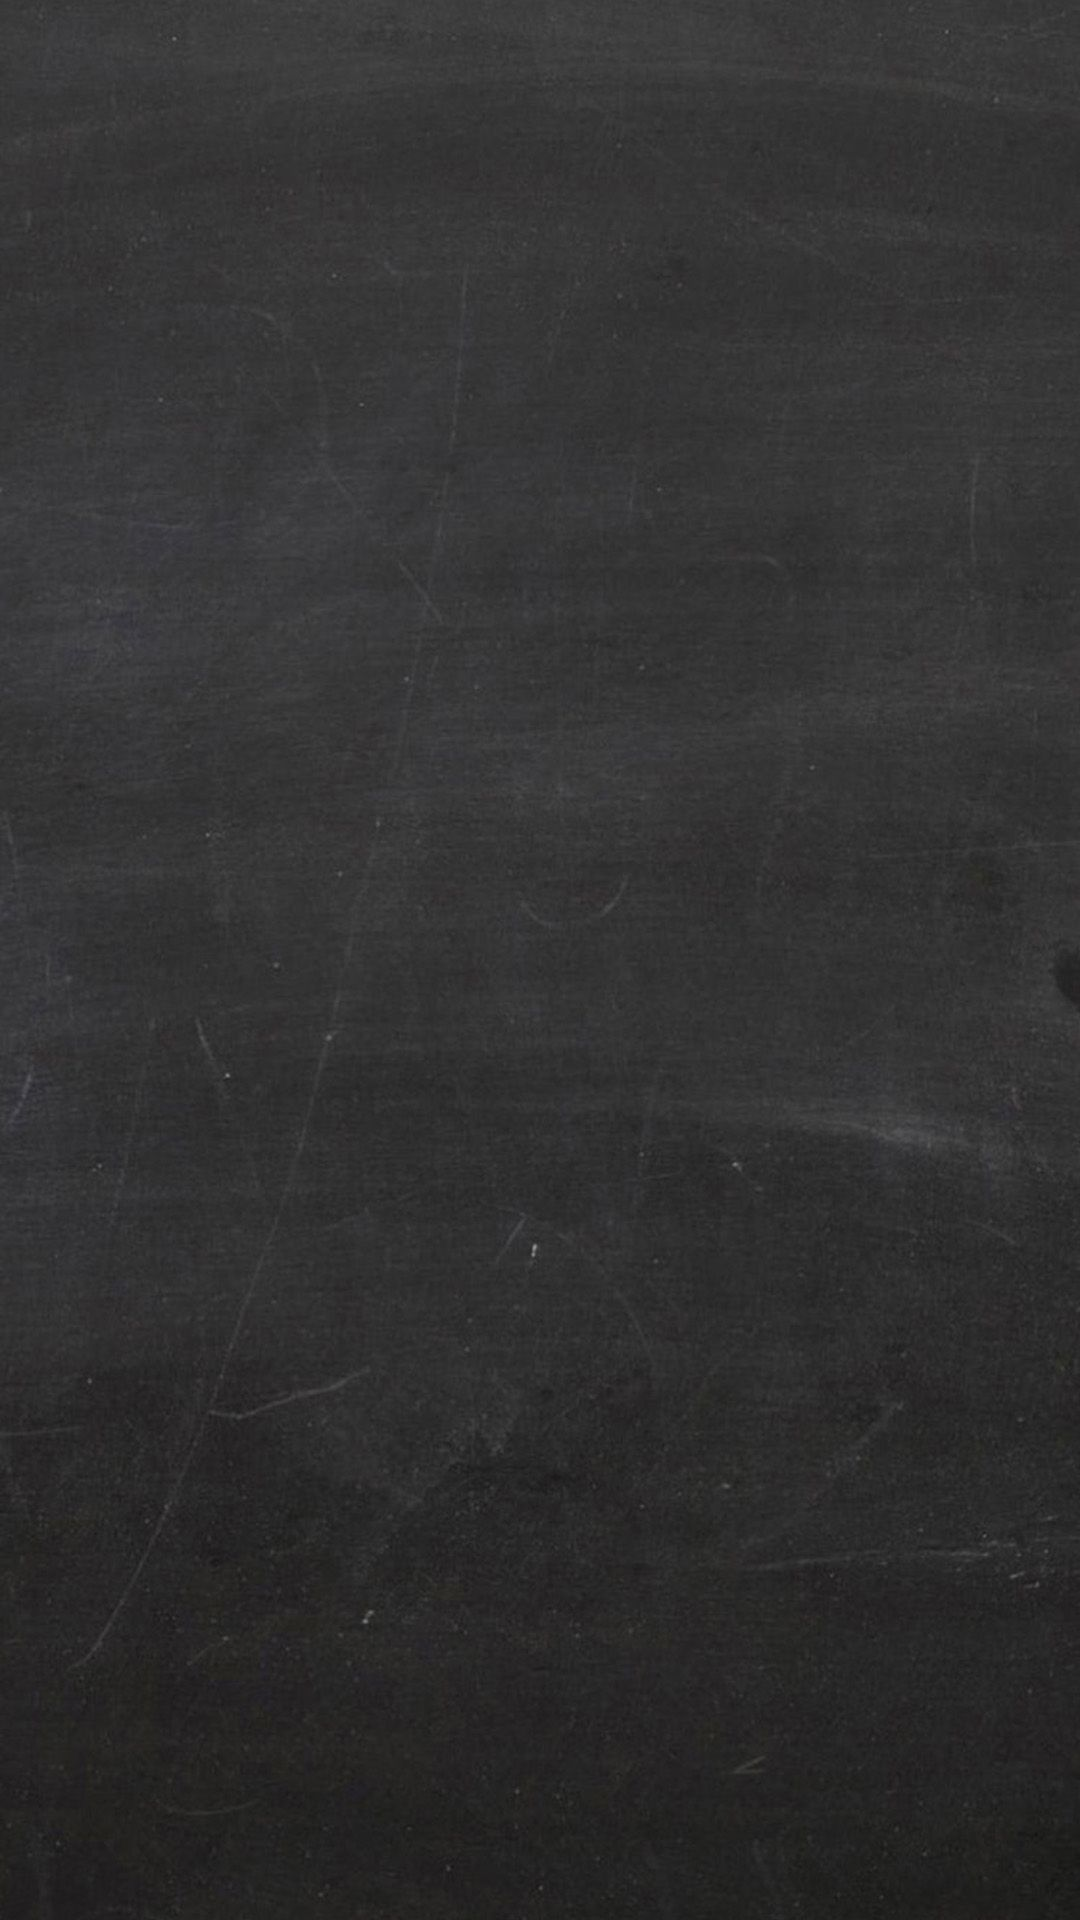 Blackboard Iphone Wallpaper Wallpaper Iphone 6 Wallpaper